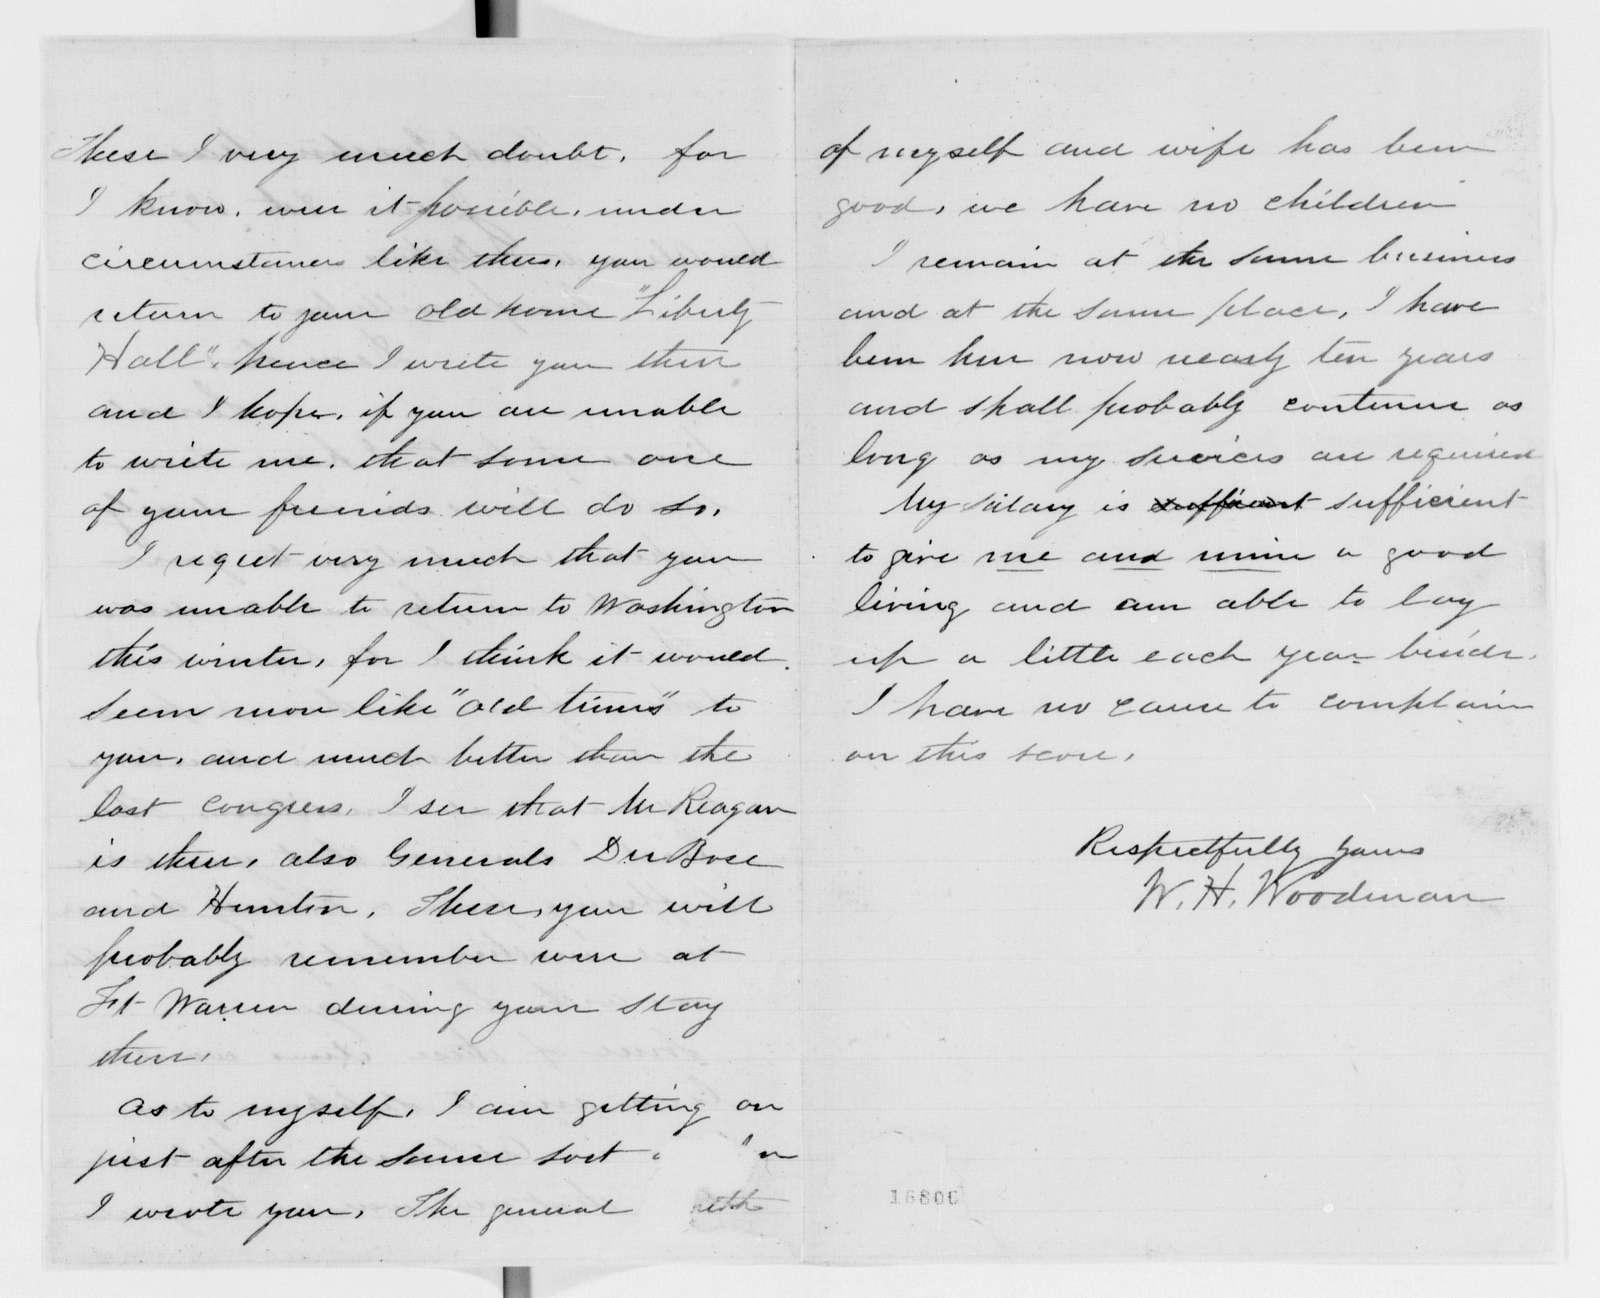 Alexander Hamilton Stephens Papers: General Correspondence, 1784-1886; 1875, Nov. 11-1876, Jan. 21